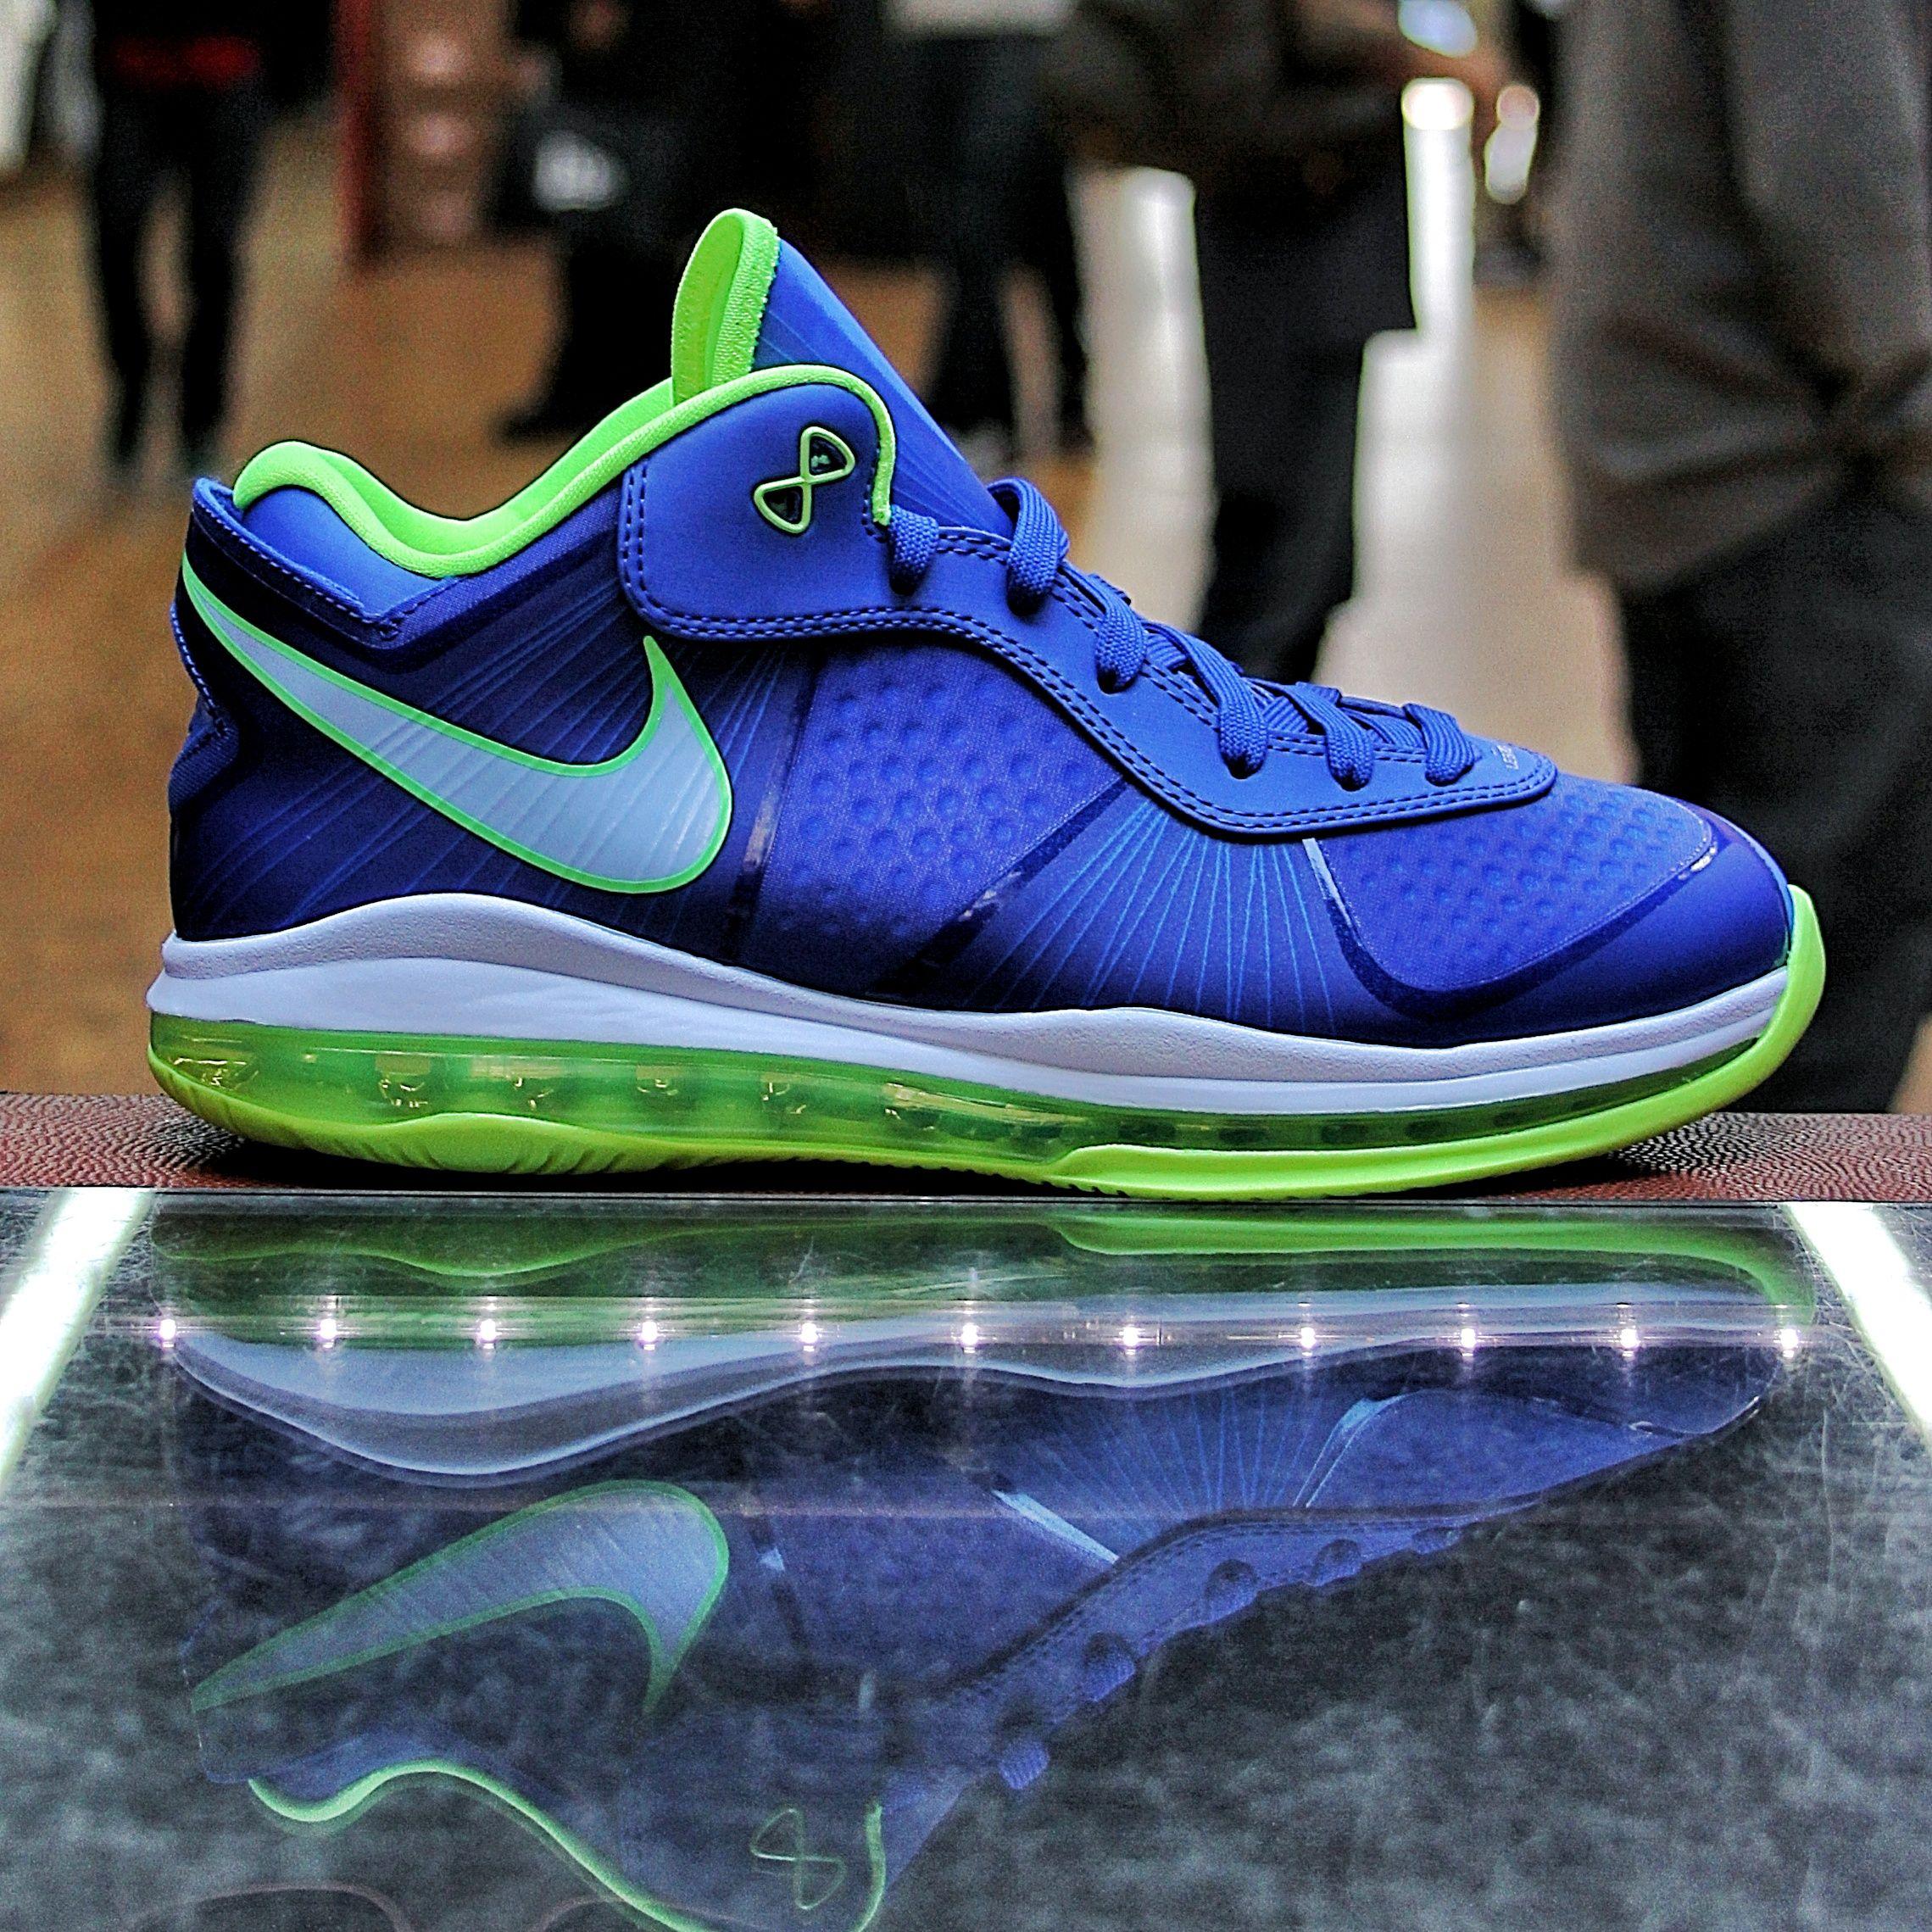 7214234f44a3 Nike LeBron 8 v 2 Low -